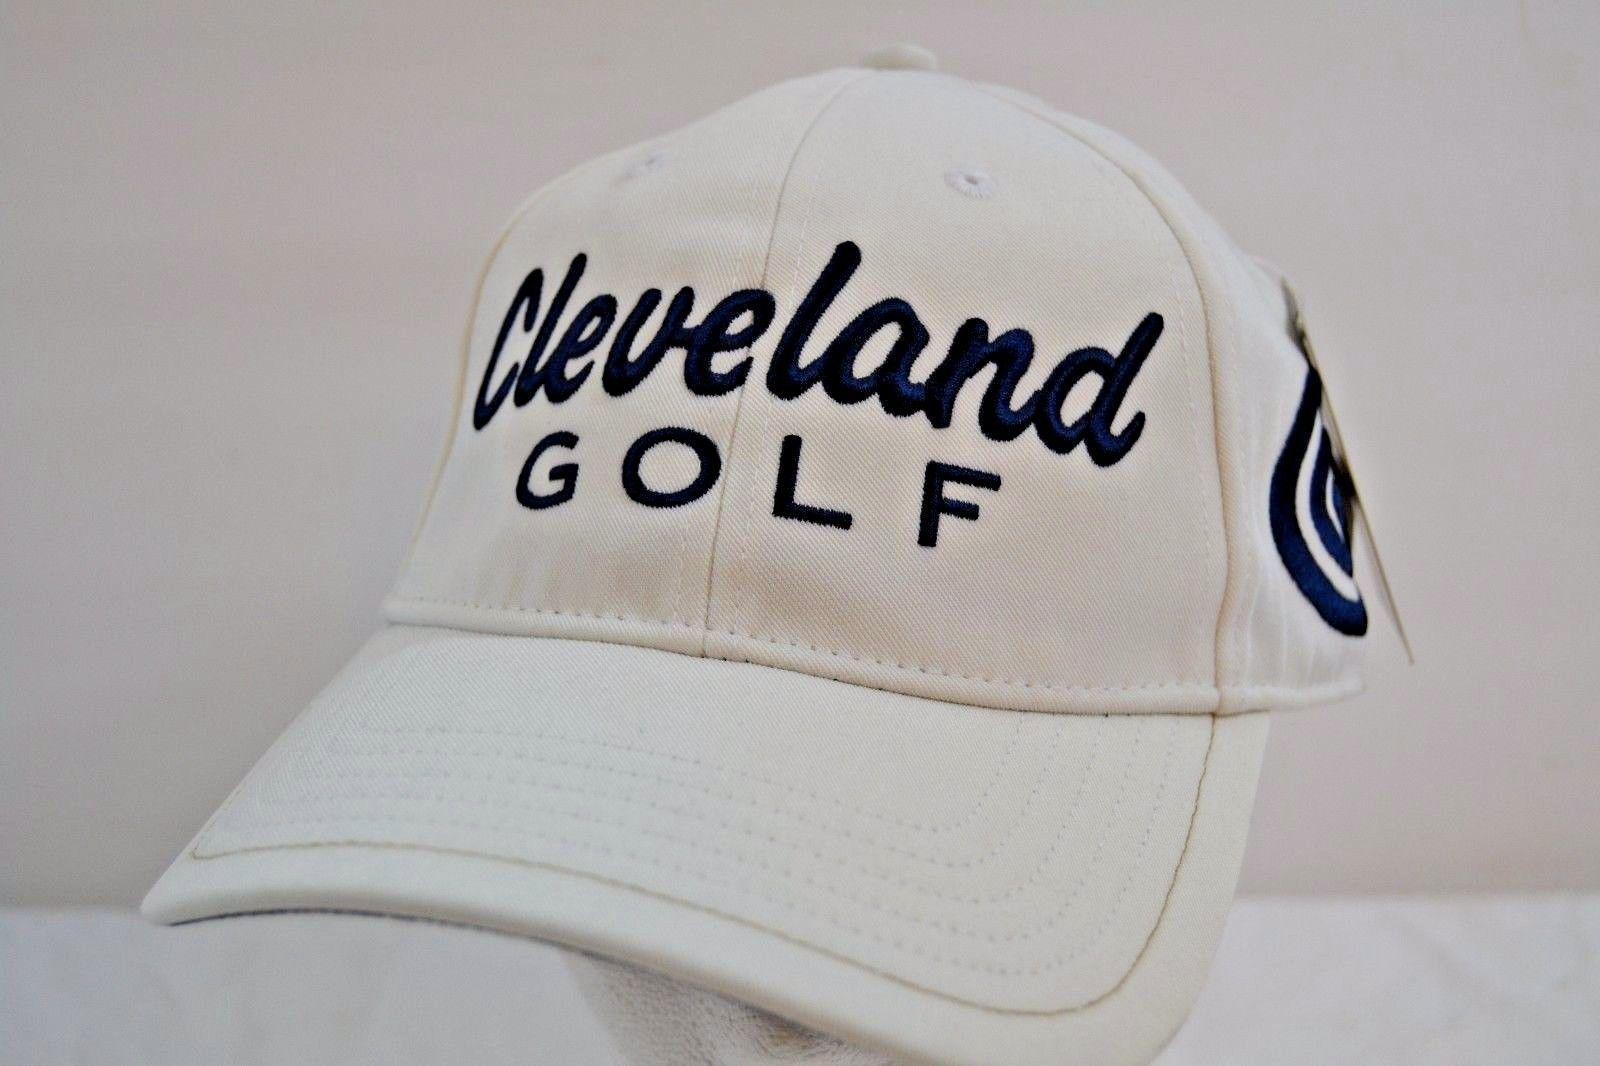 Cleveland Golf Tour Fit Mesh White Black Baseball Cap NWT Tour Fit L ... b0e0426b0eb8